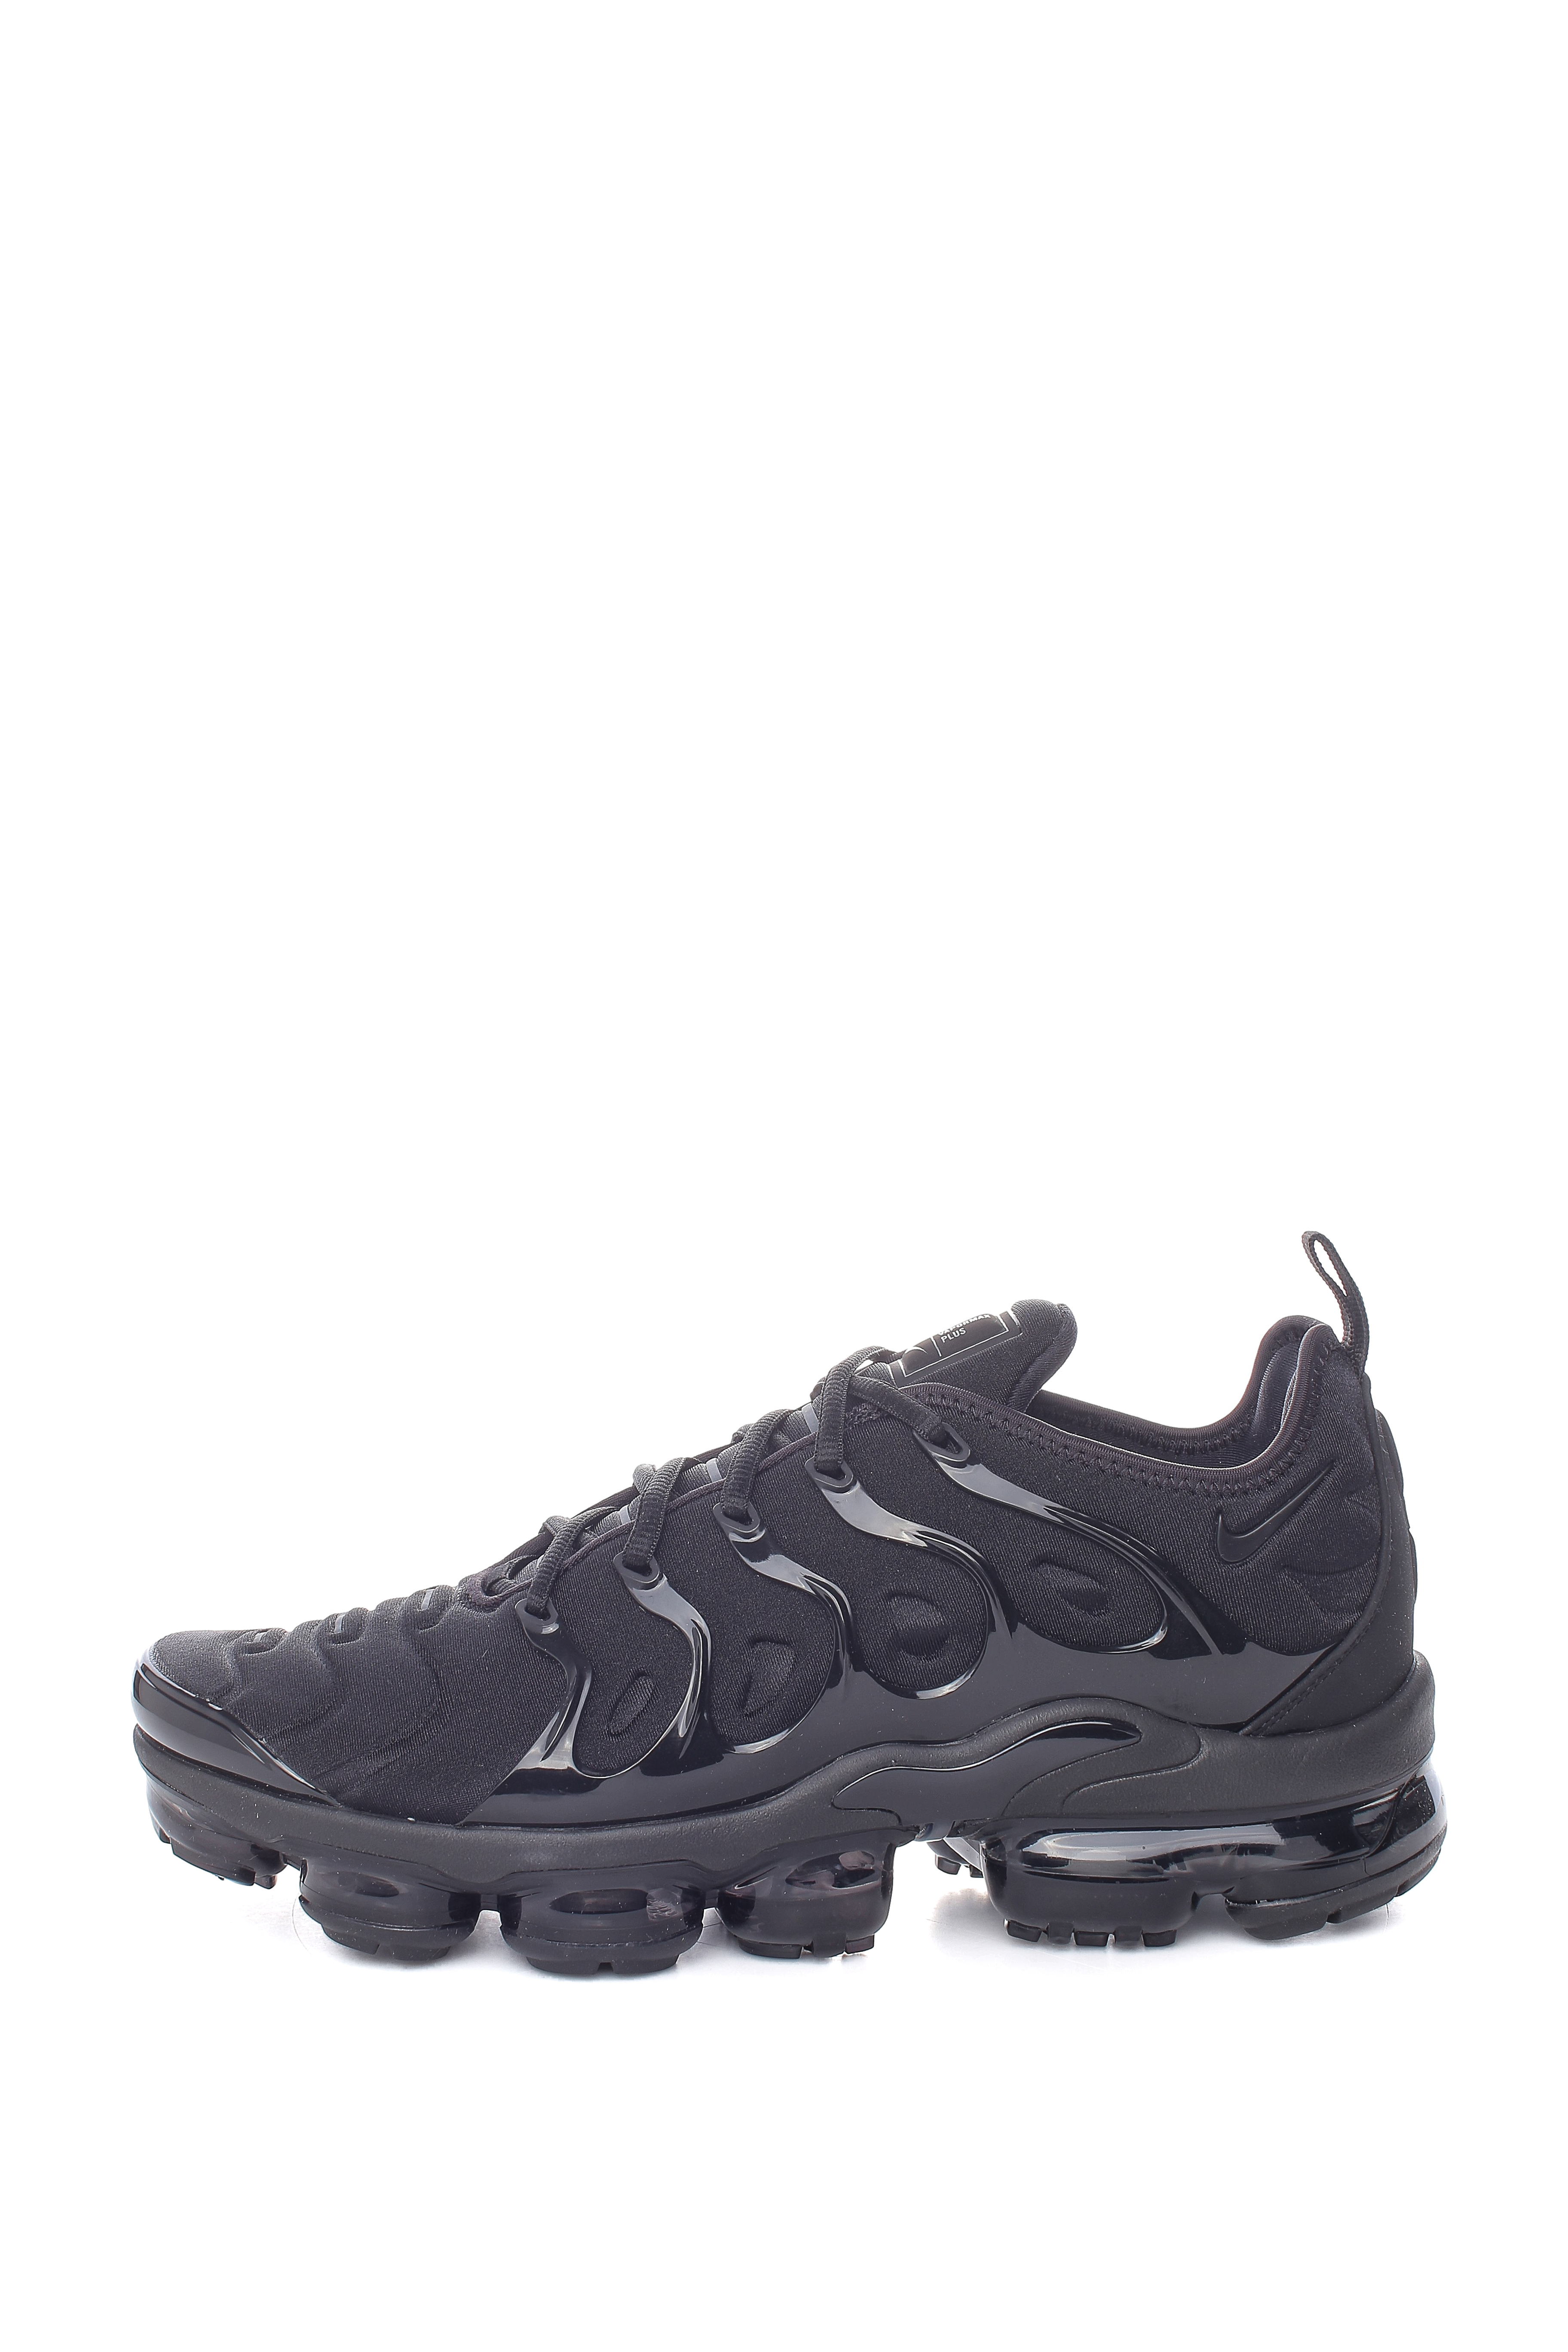 NIKE – Ανδρικά αθλητικά παπούτσια NIKE AIR VAPORMAX PLUS μαύρα